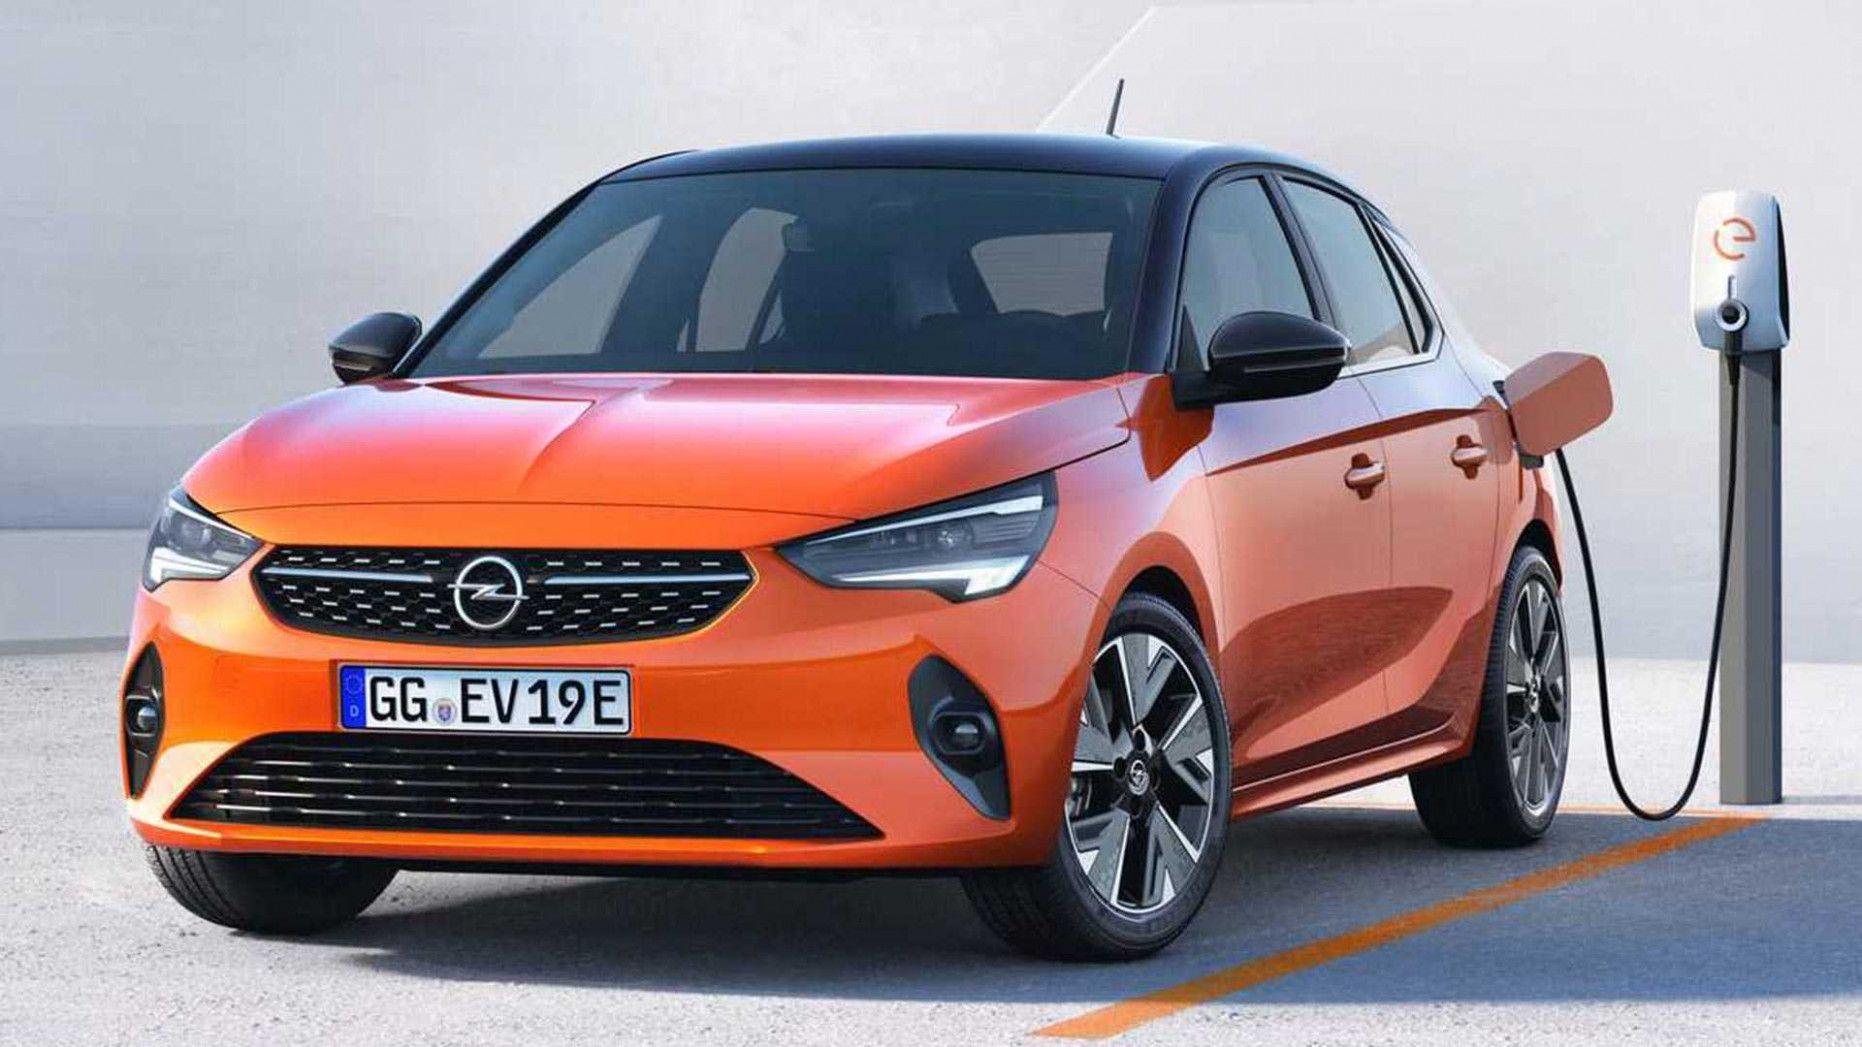 9 Wallpaper Opel Electric Car 2020 In 2020 Opel Corsa Vauxhall Corsa City Car